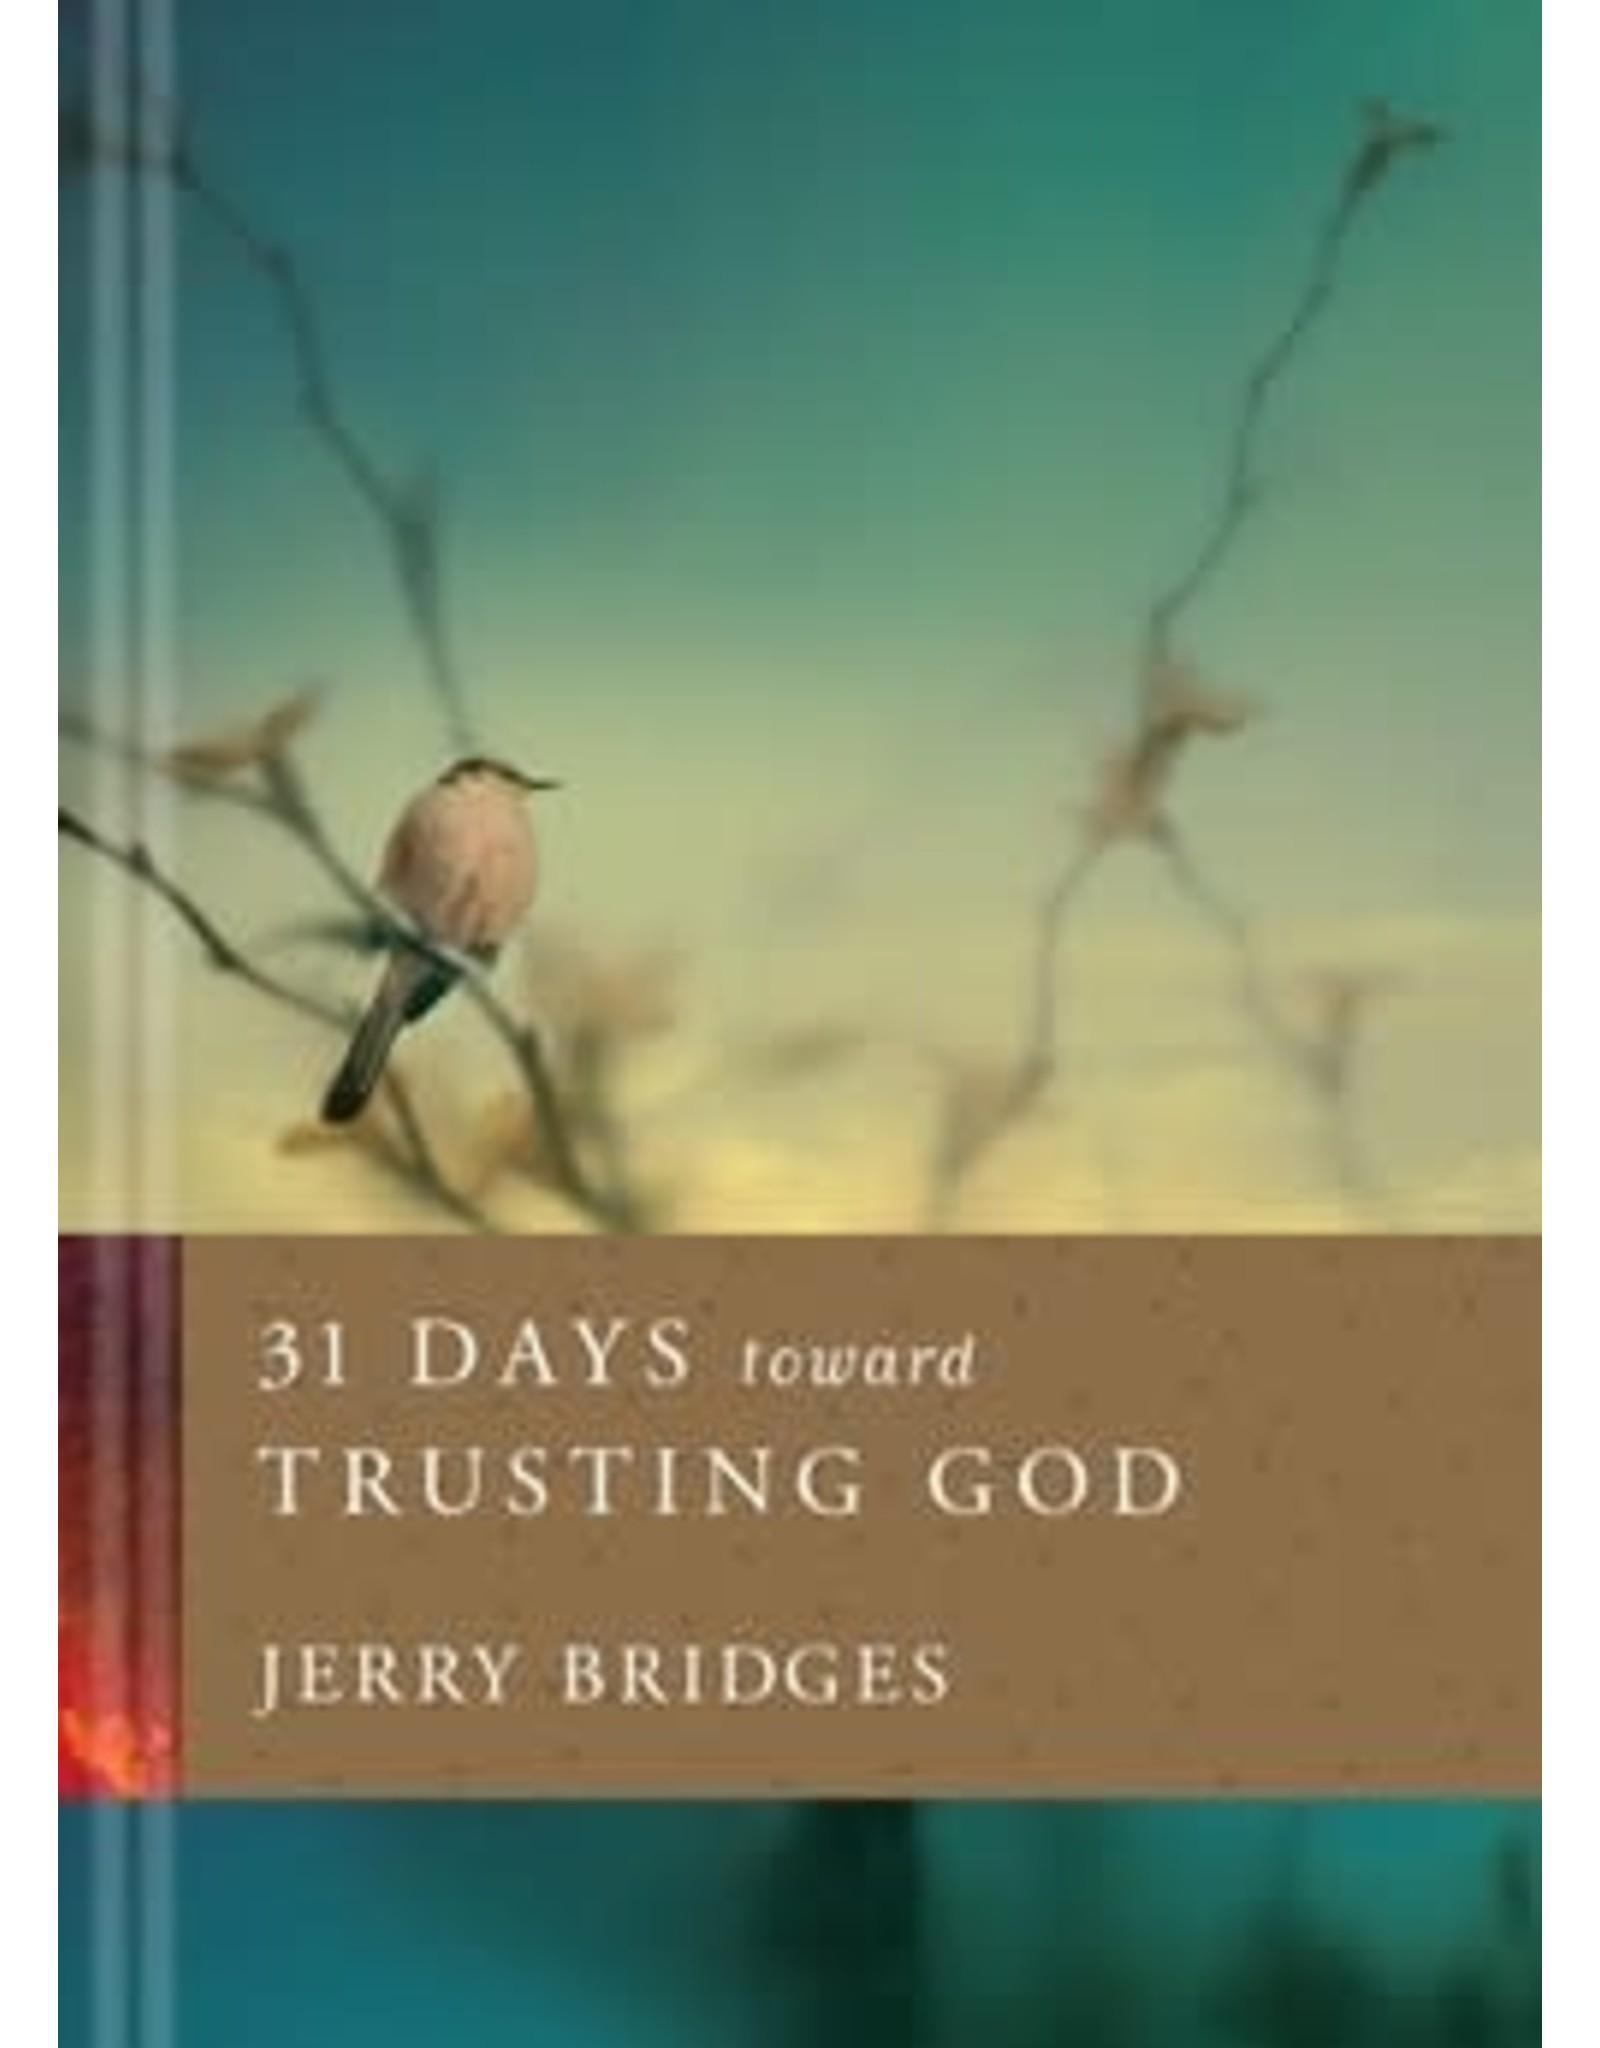 Bridges 31 Days Toward Trusting God